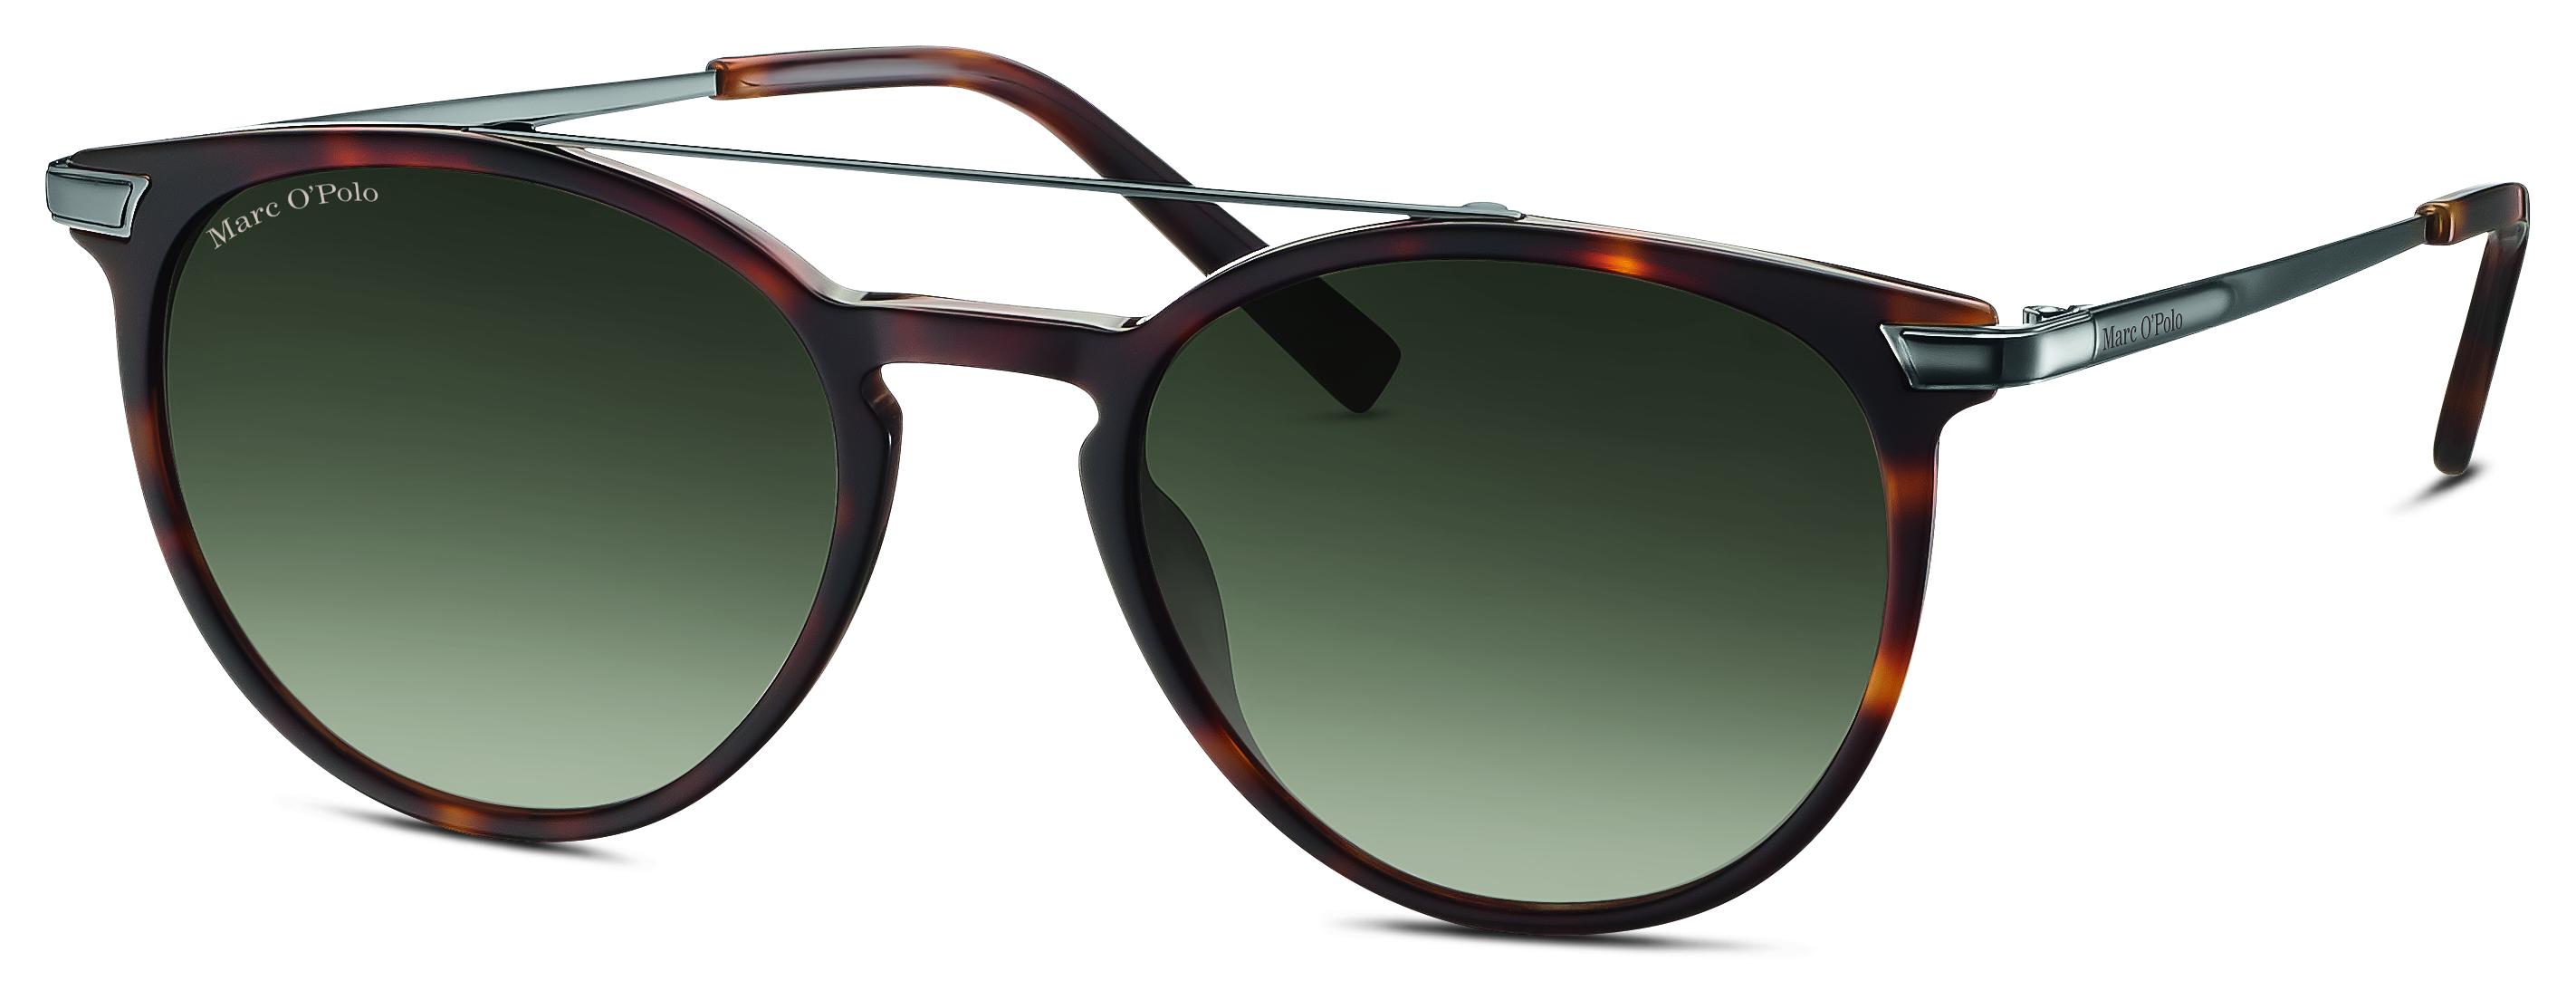 MARC O'POLO Eyewear  506151 60